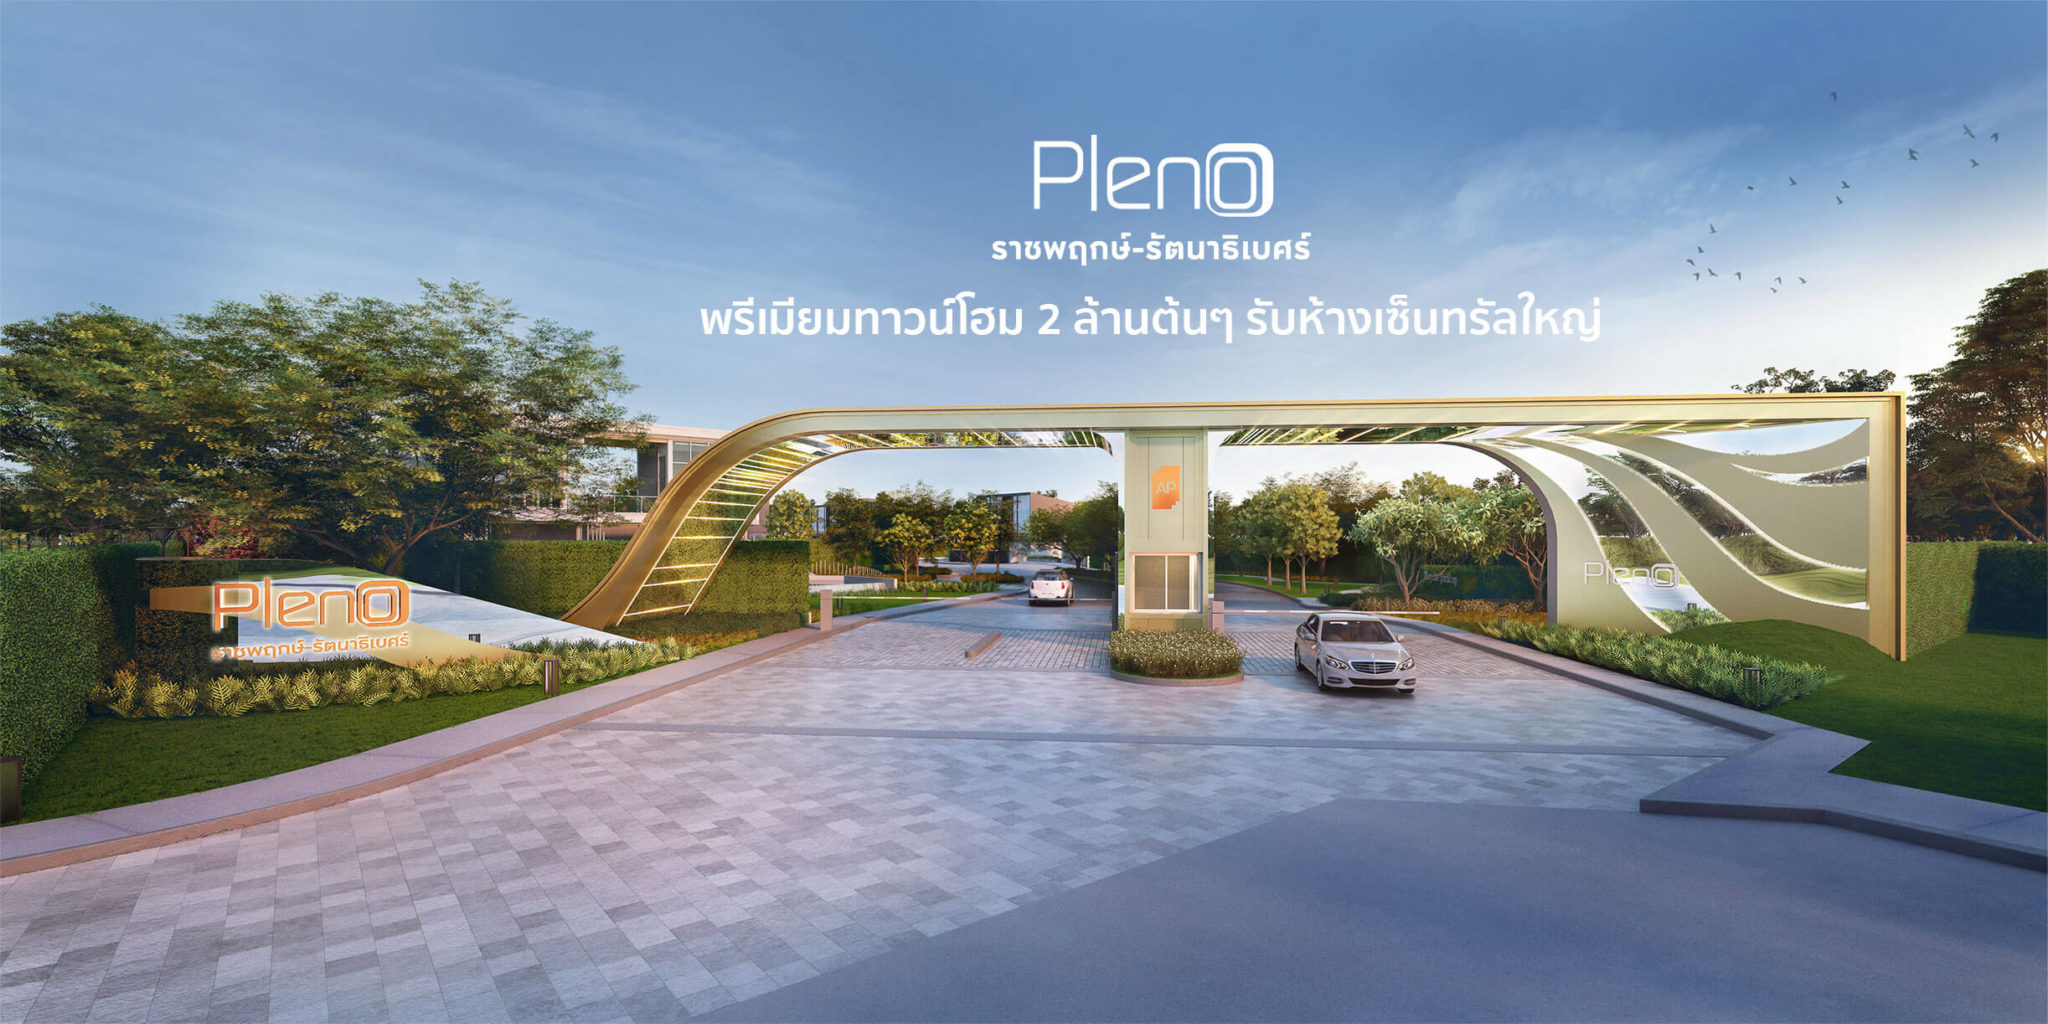 Pleno ราชพฤกษ์-รัตนาธิเบศร์ พรีเมียมทาวน์โฮมเพียง 2 ล้านต้นๆ รับห้างเซ็นทรัลใหญ่ปี 62 13 - AP (Thailand) - เอพี (ไทยแลนด์)